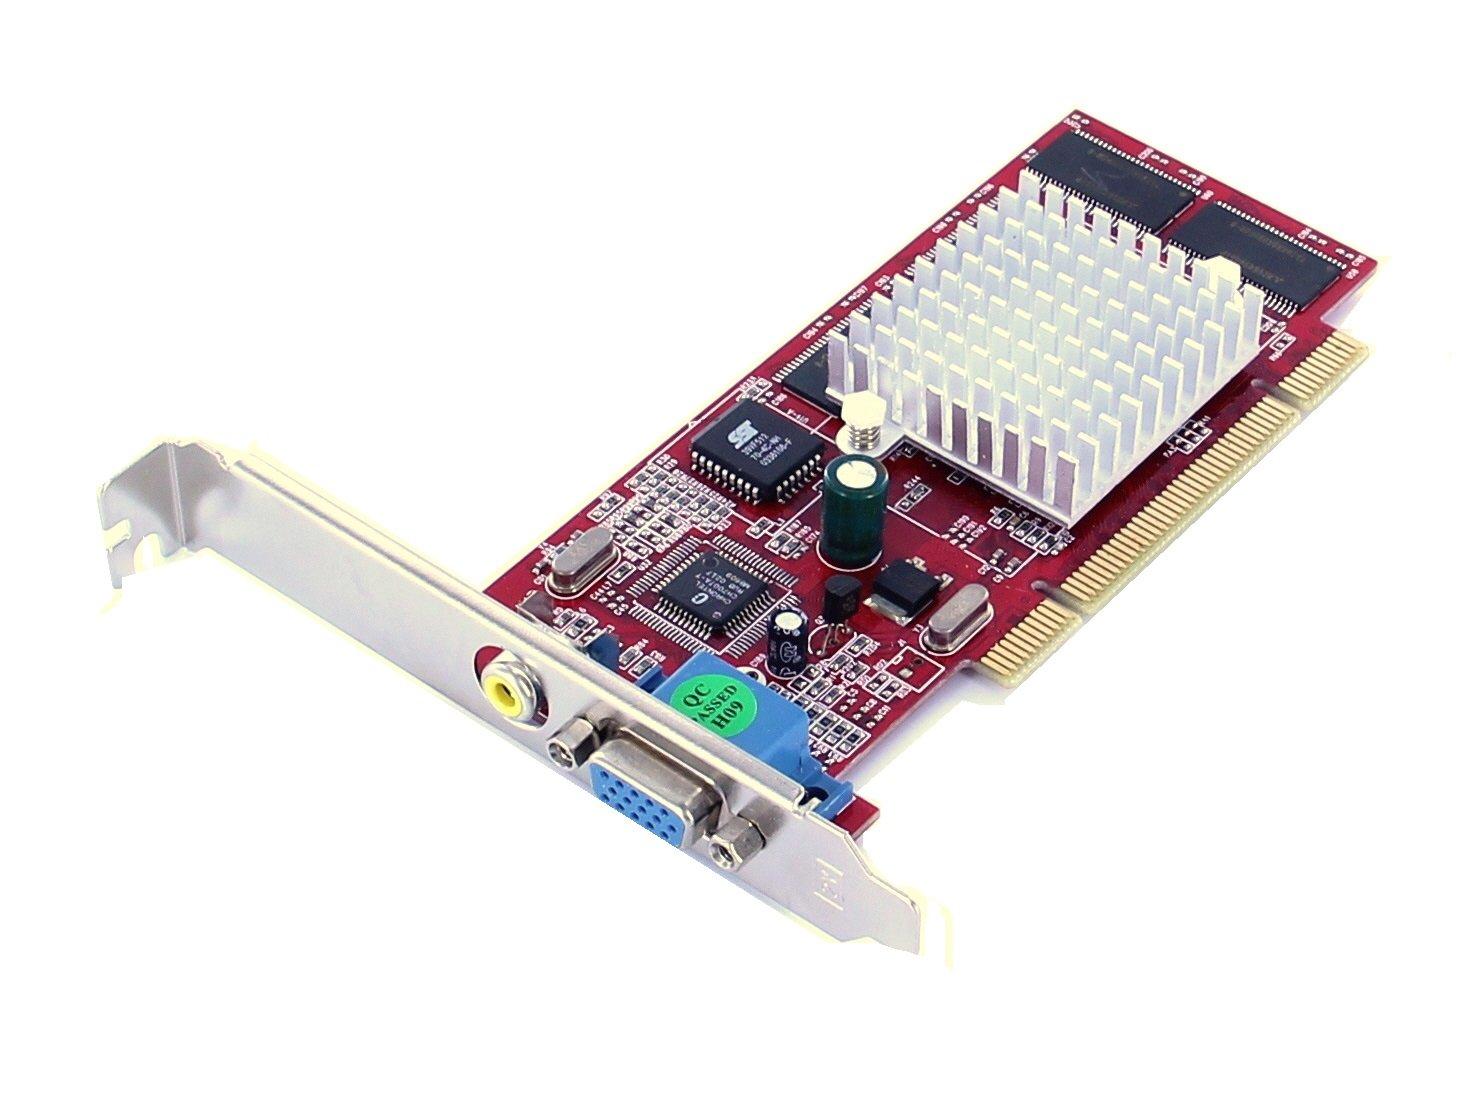 Tarjetas gráficas Nvidia GeForce PCI, 64 MB hasta 512MB memoria